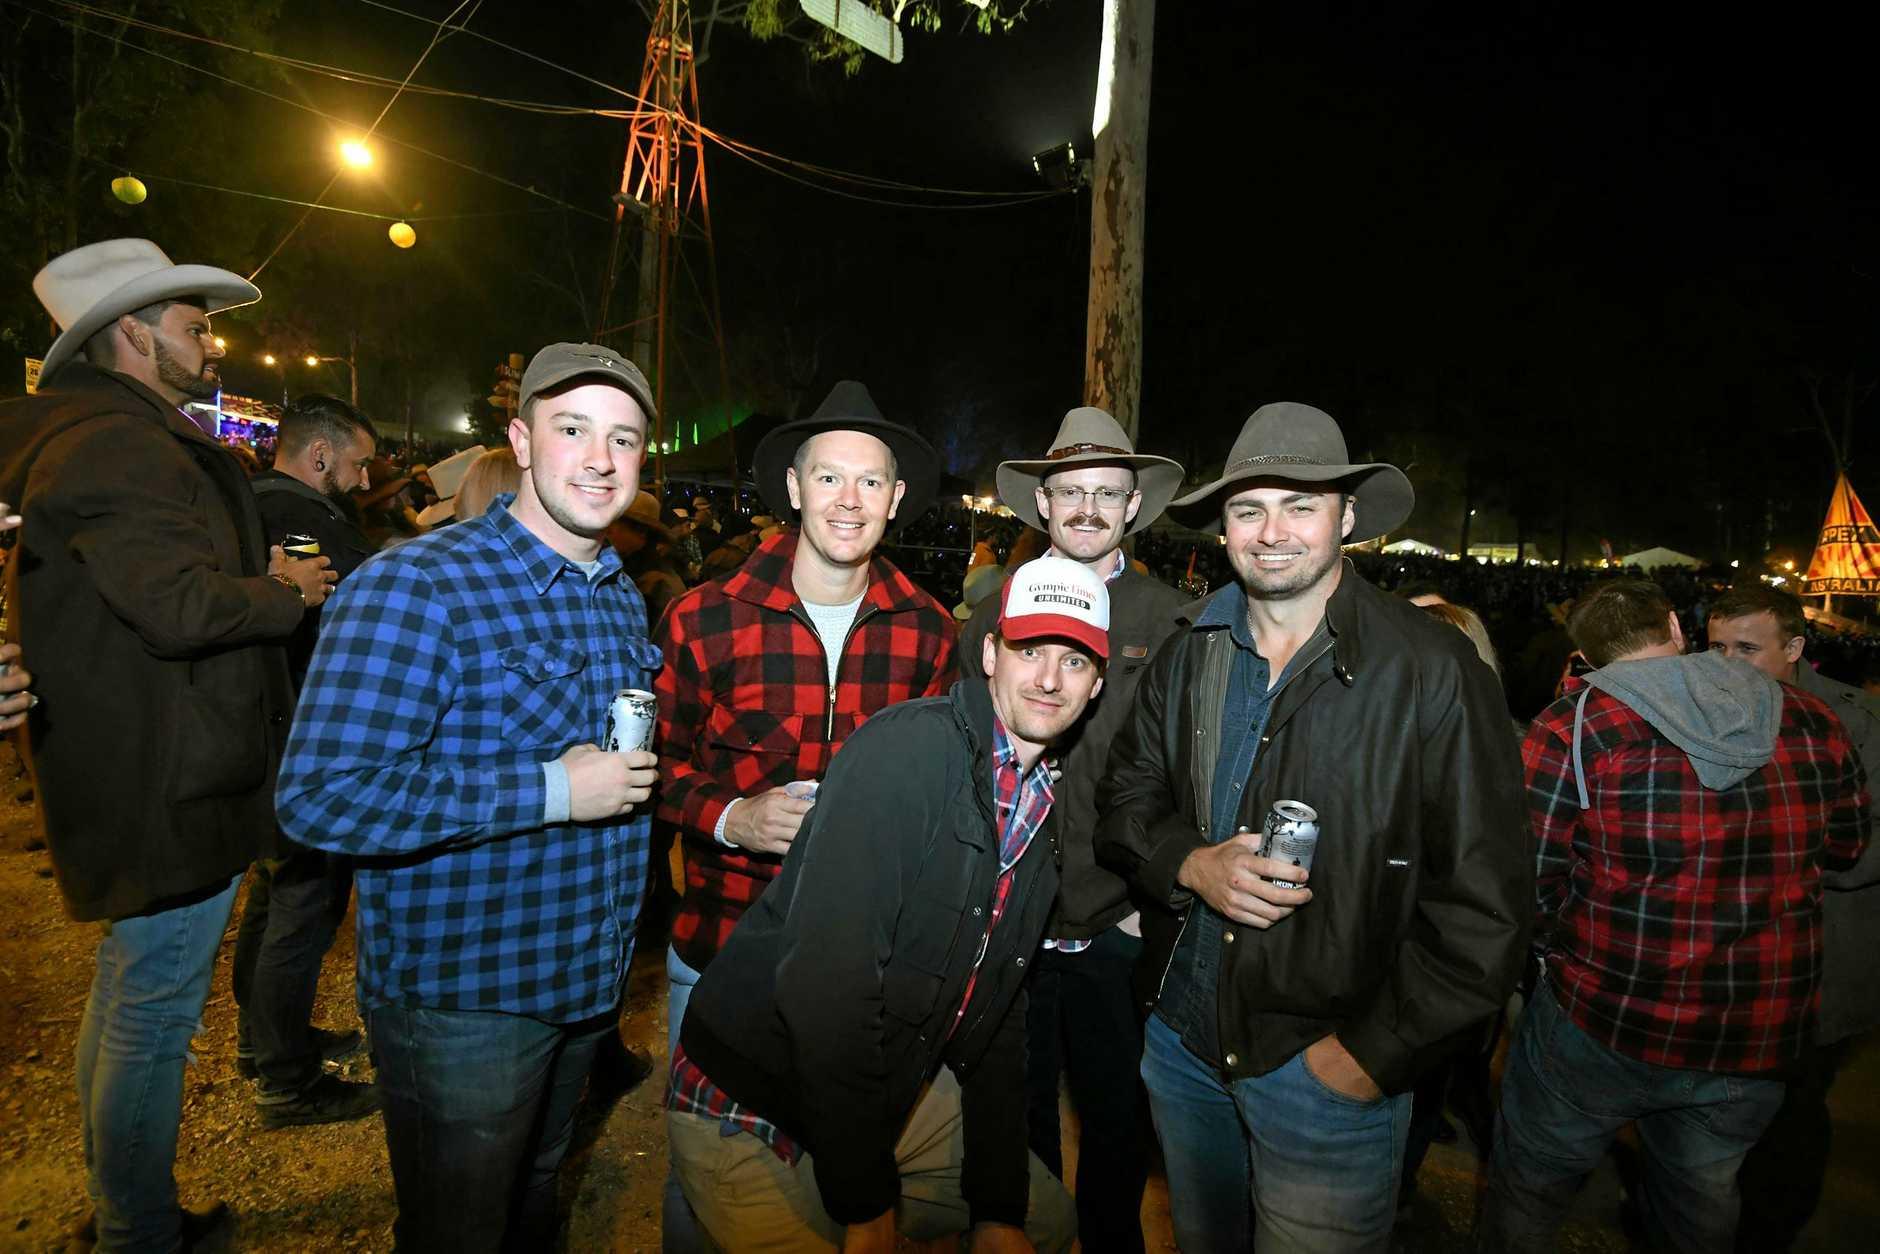 Gympie Muster 2018 Hayden Trask, dan Mcmahon, Rohan Loard, Amthony Zipf (front) Jack Daniel